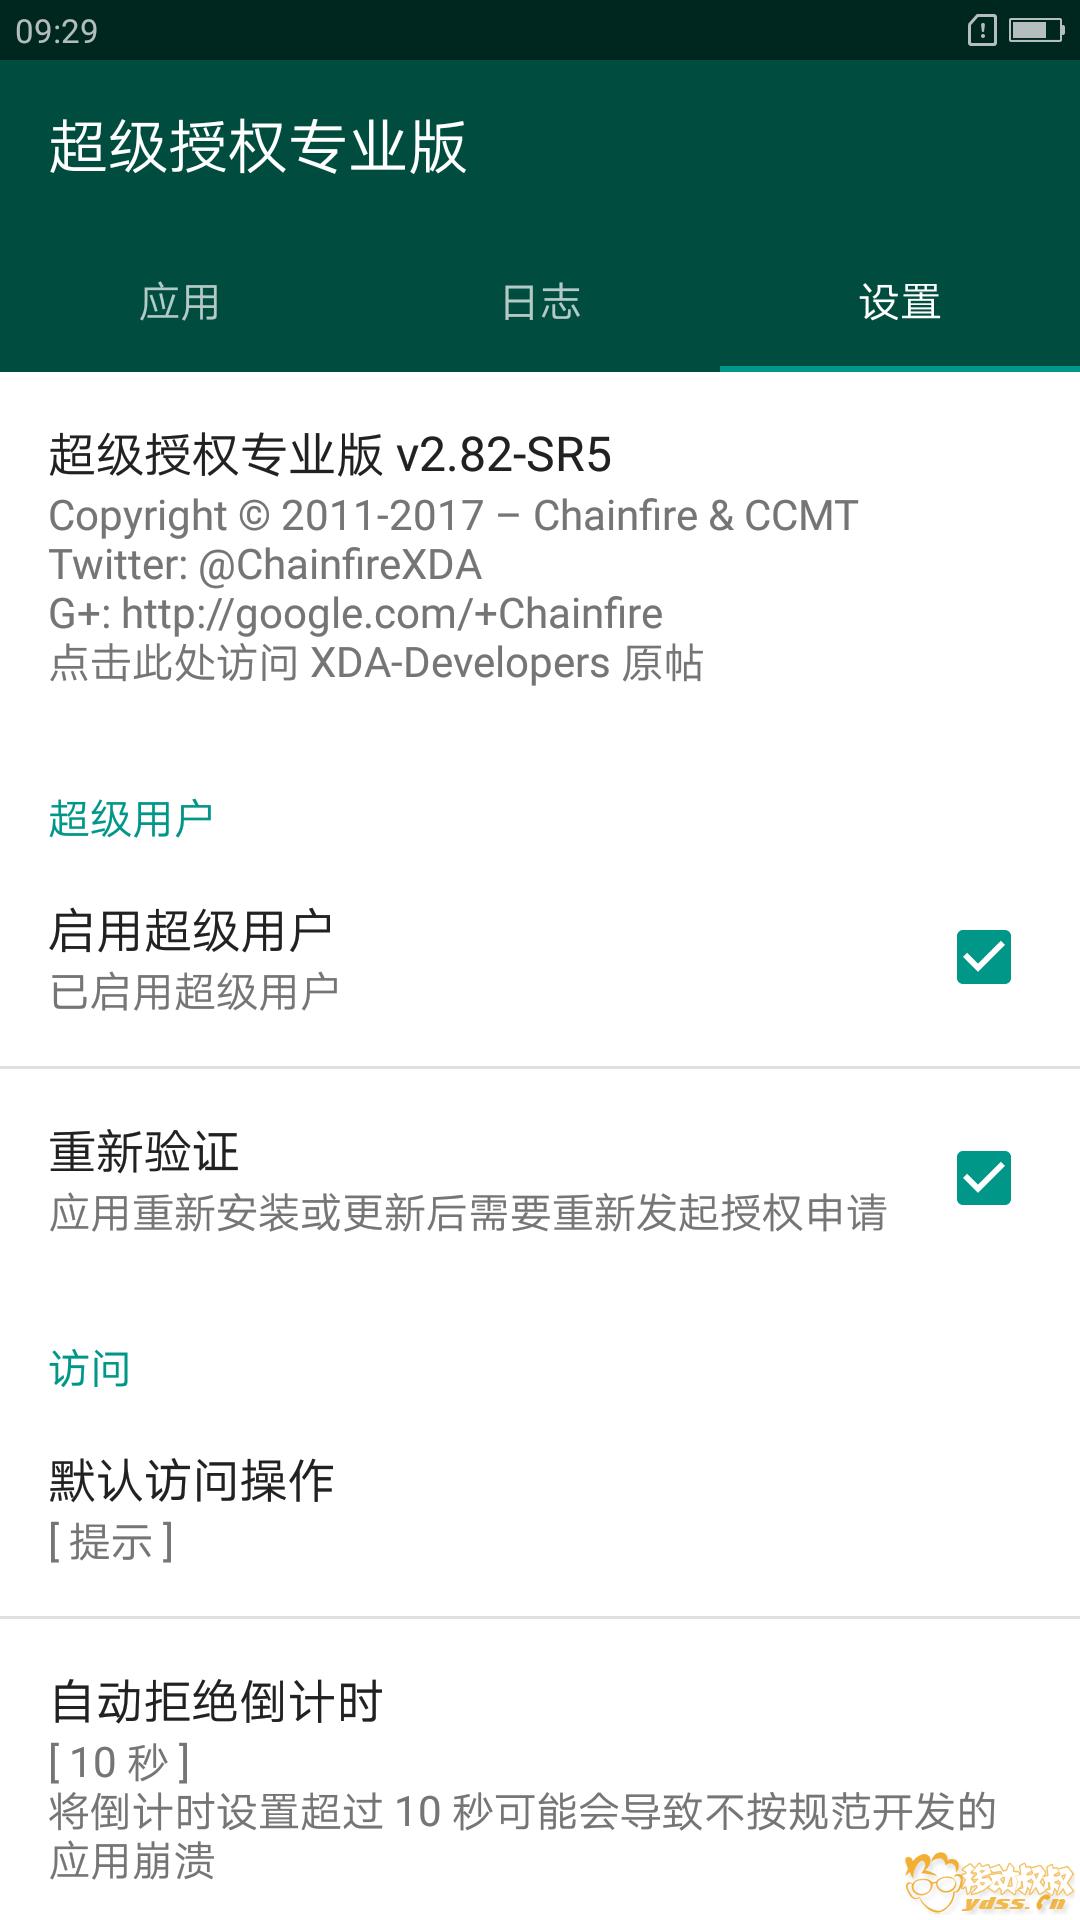 Screenshot_2018-03-24-09-29-58-0746149818.png